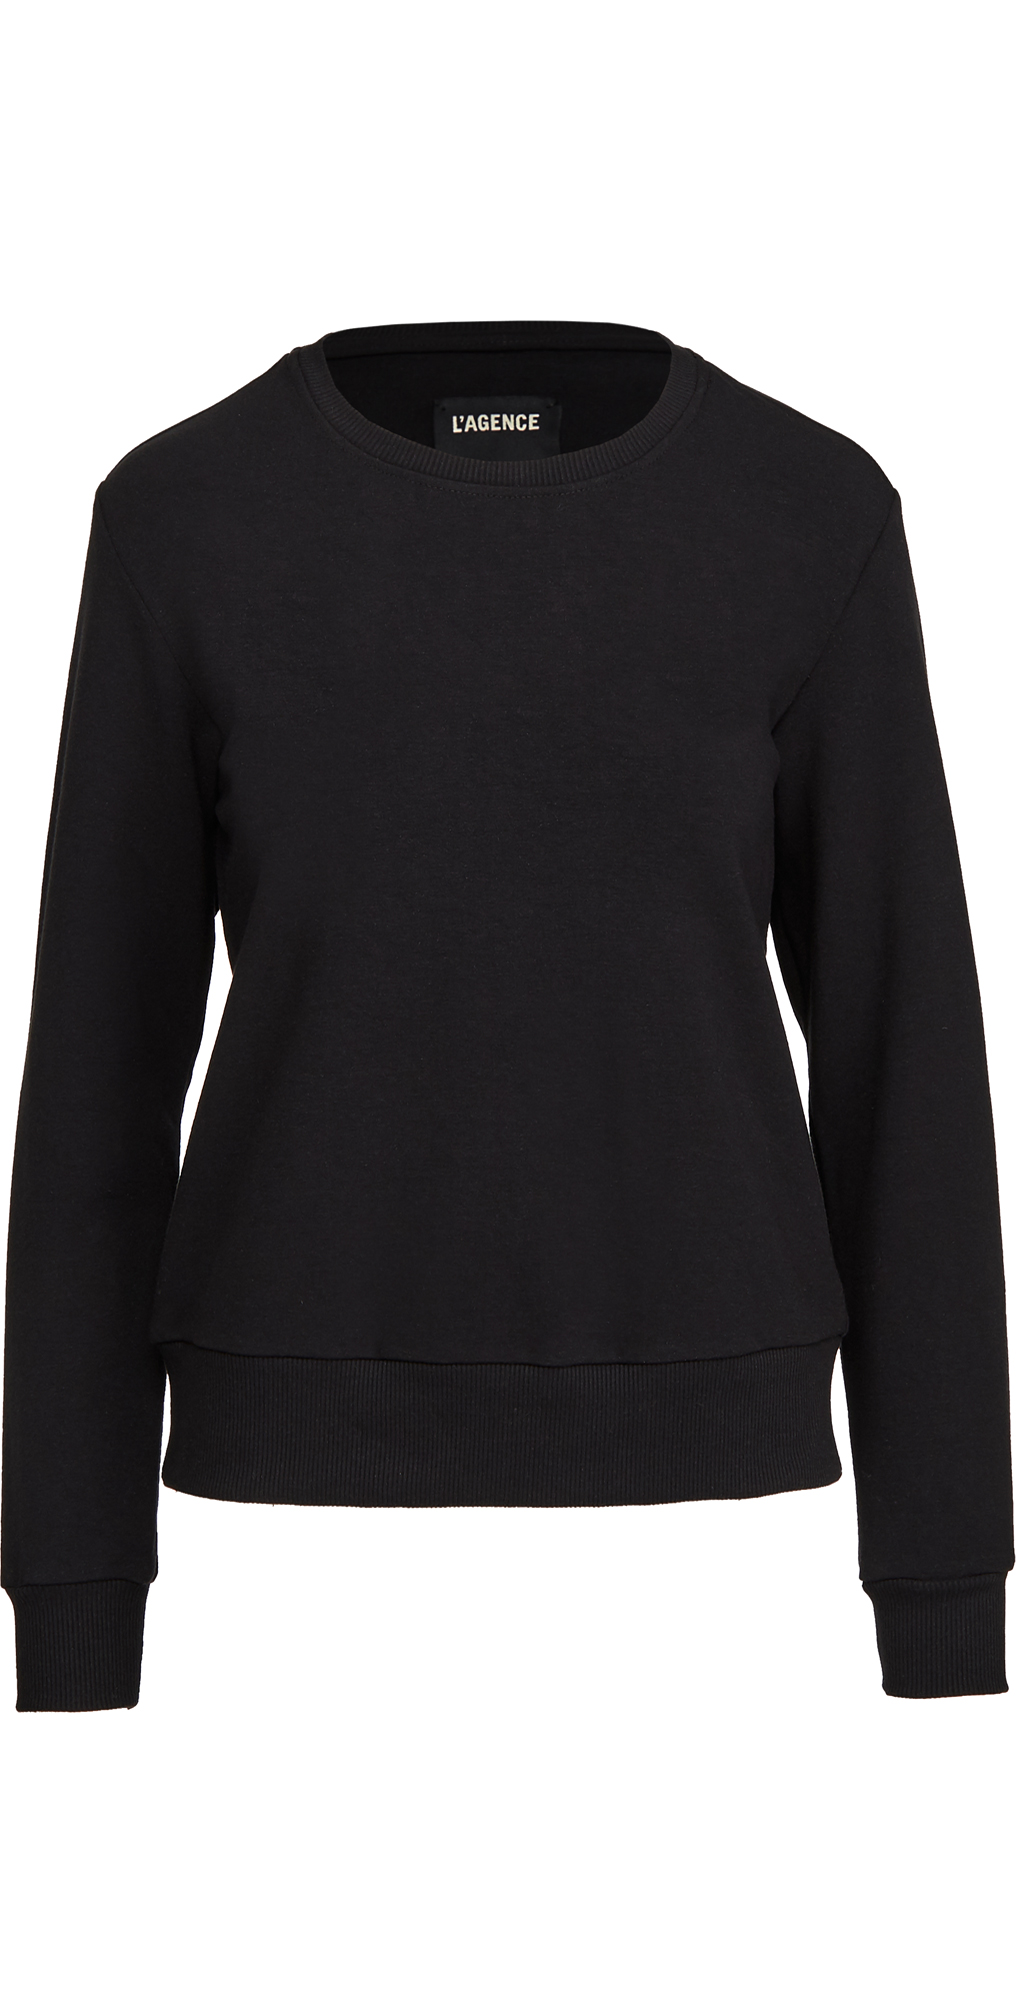 L'AGENCE Heidi Crew Cities Sweatshirt